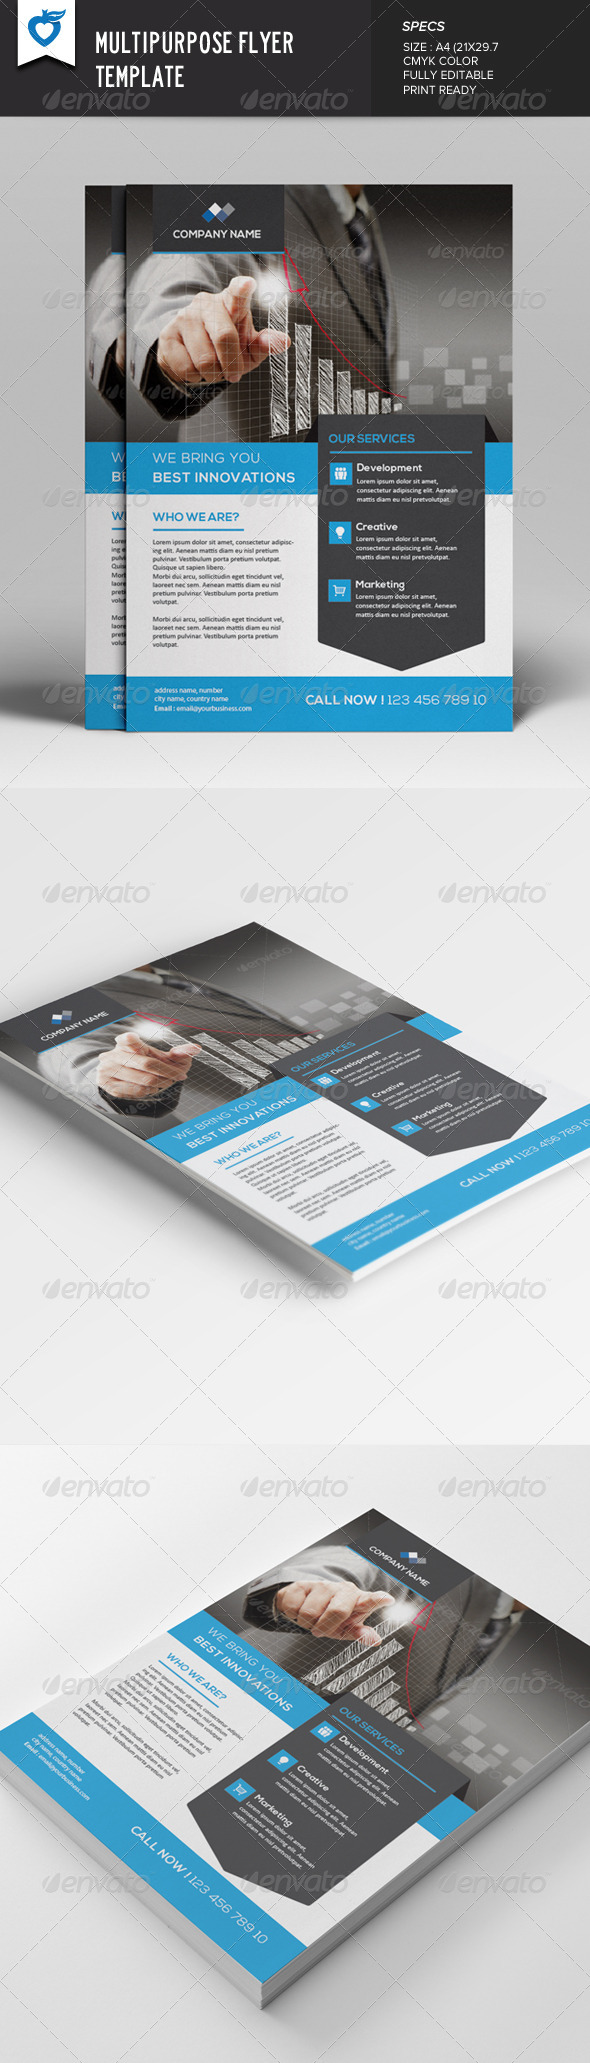 GraphicRiver Multipurpose Flyer Template v2 7914671